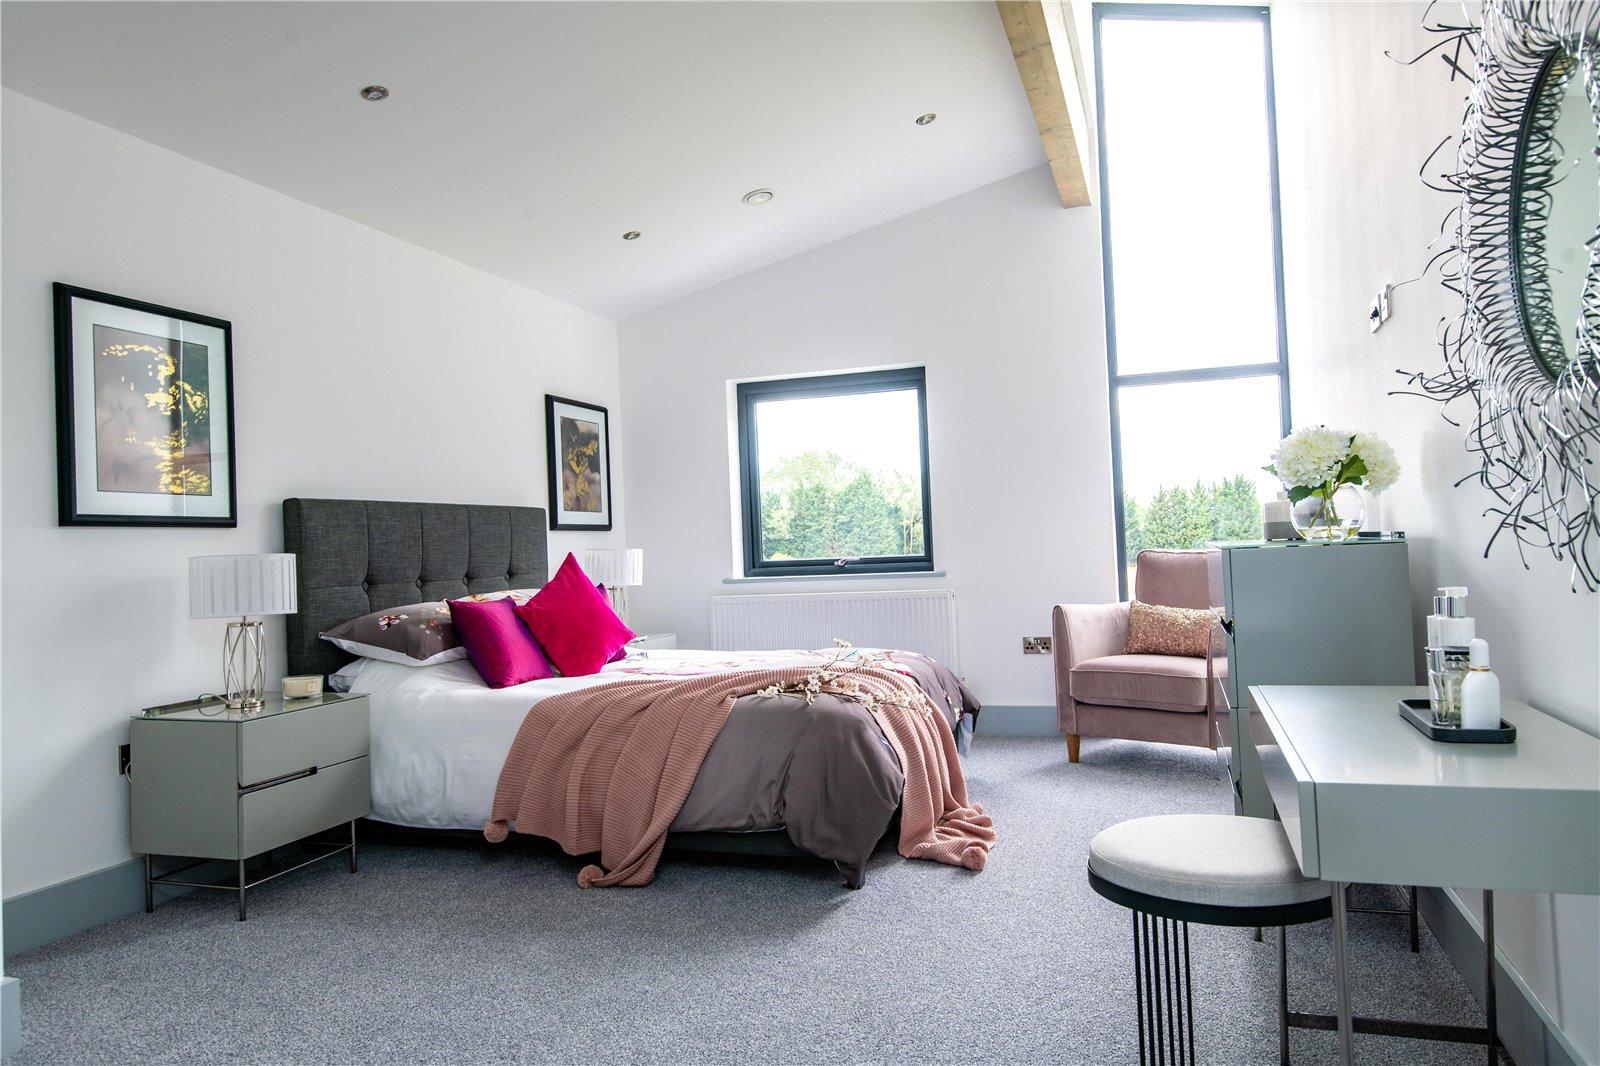 4 bed house for sale in The Range, Eynesbury Hardwicke  - Property Image 2